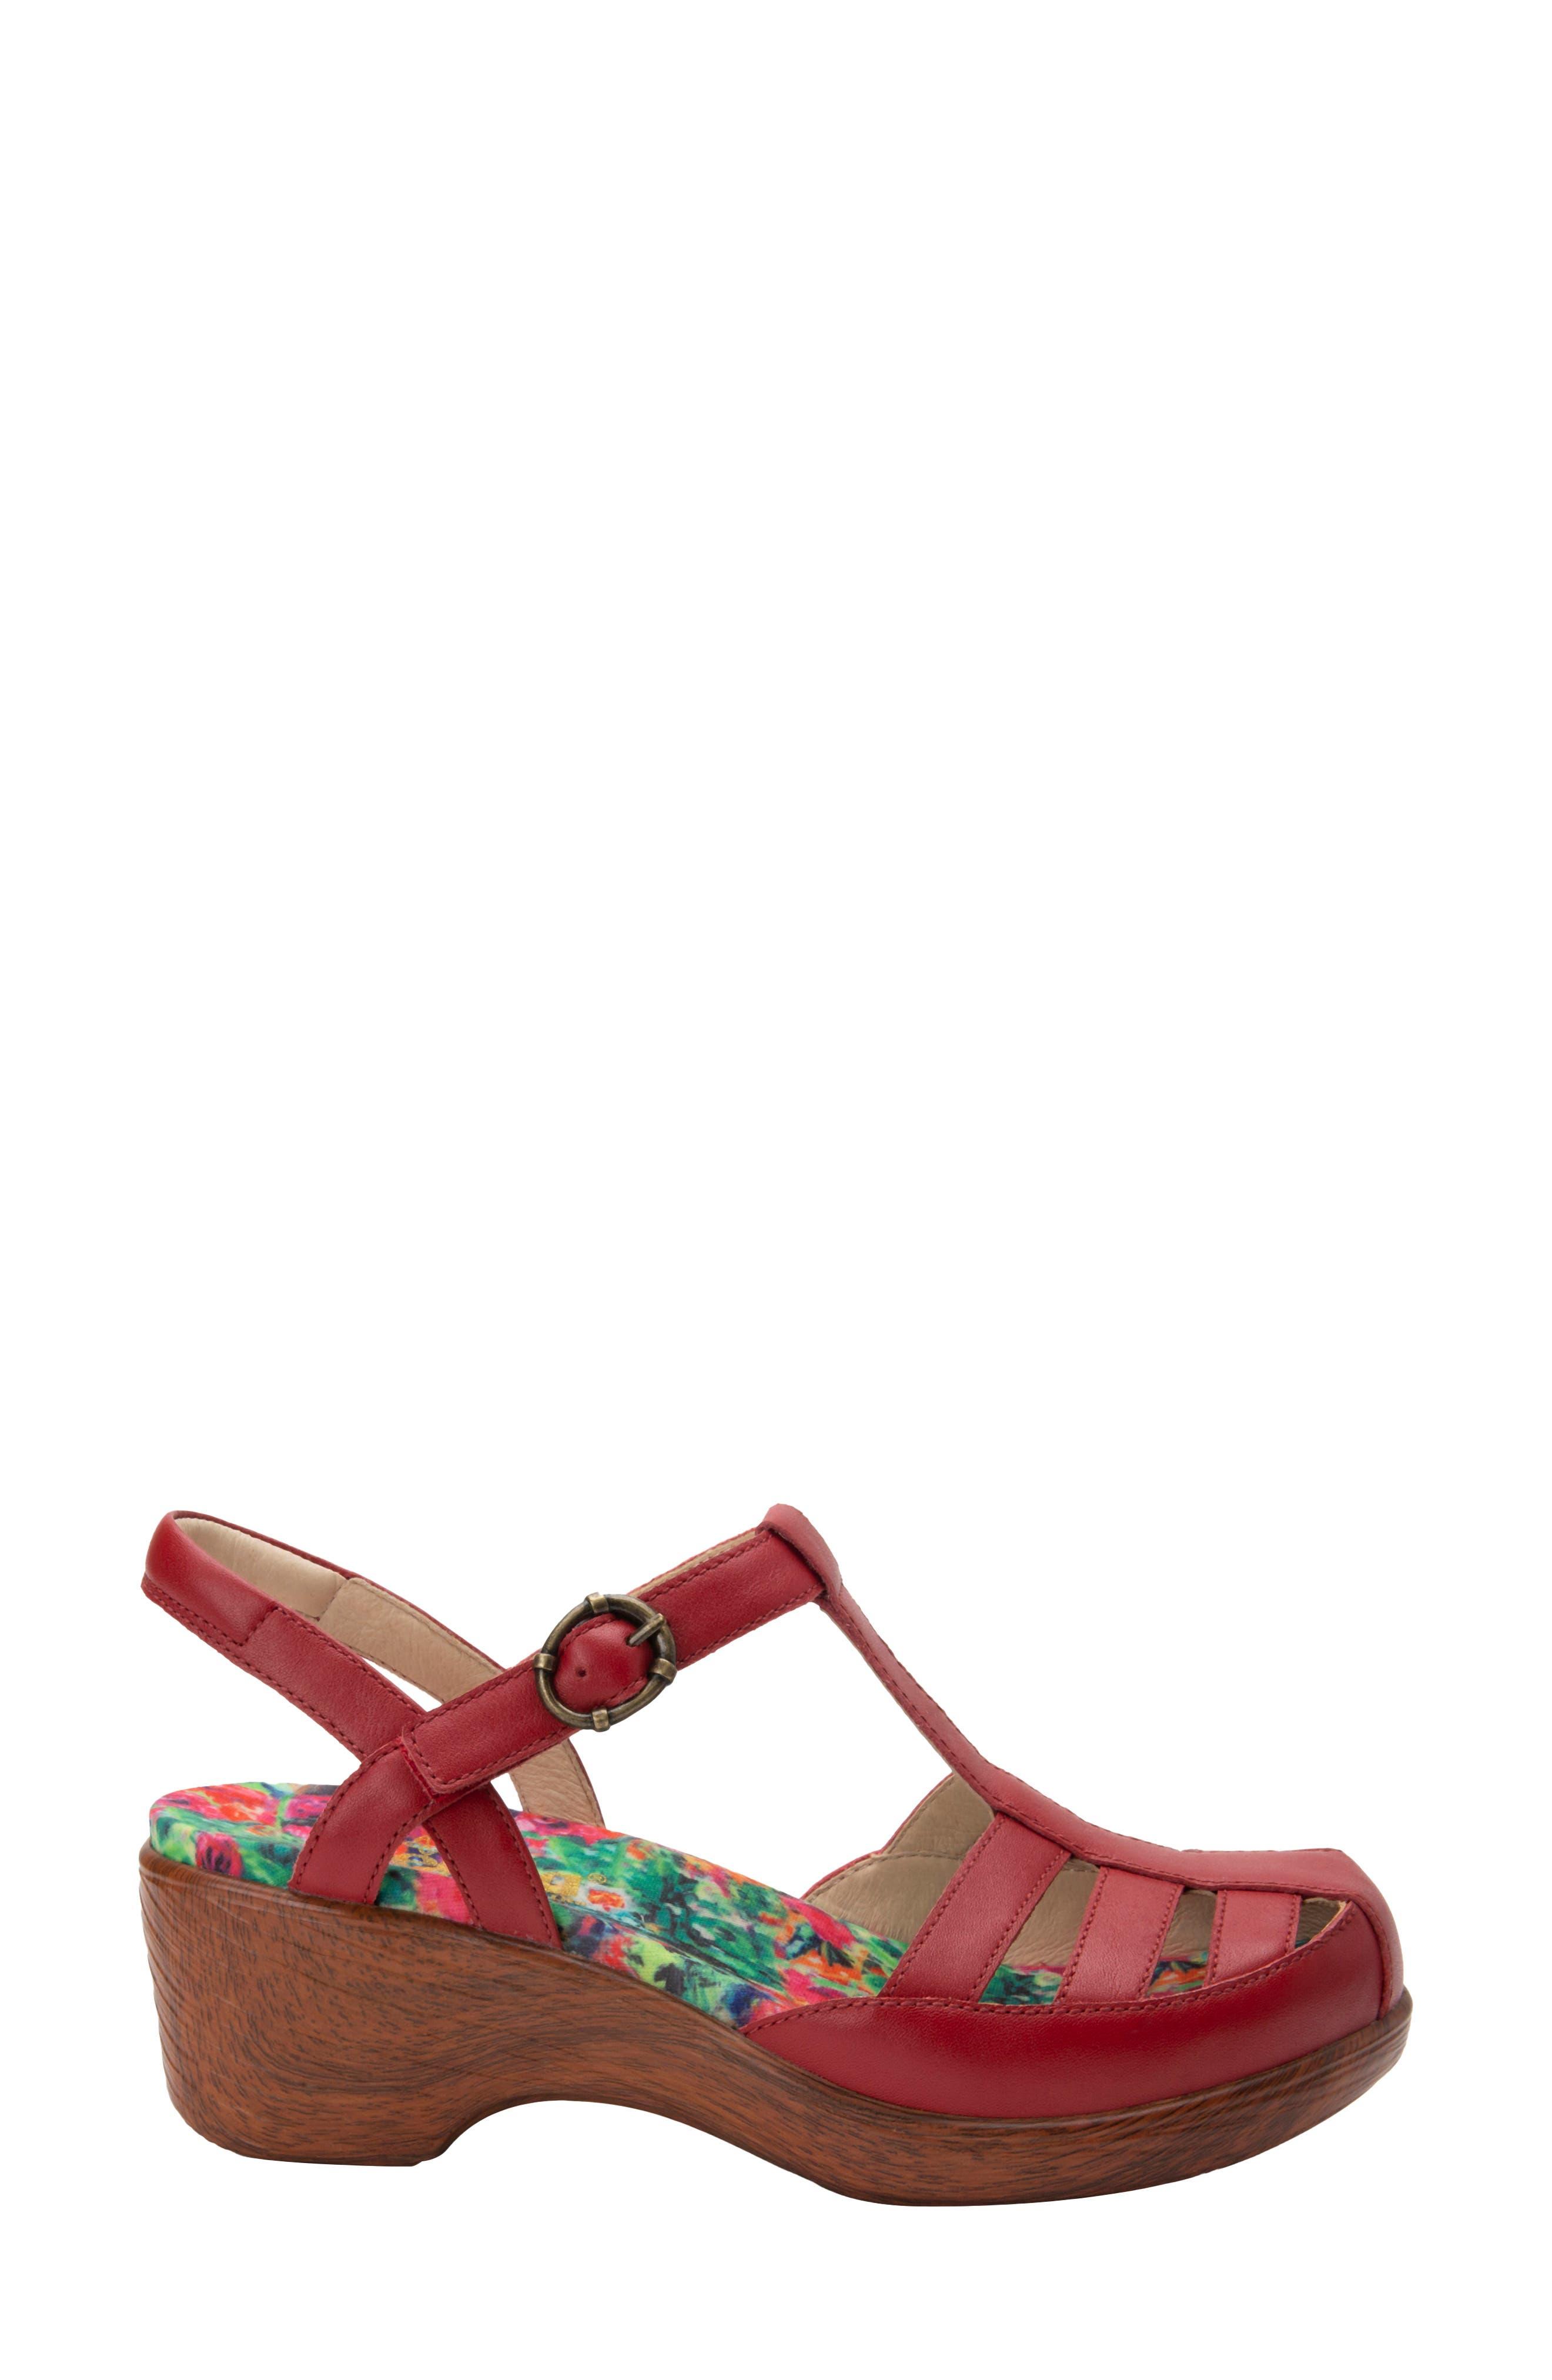 Women's Alegria Summer Clog Sandal